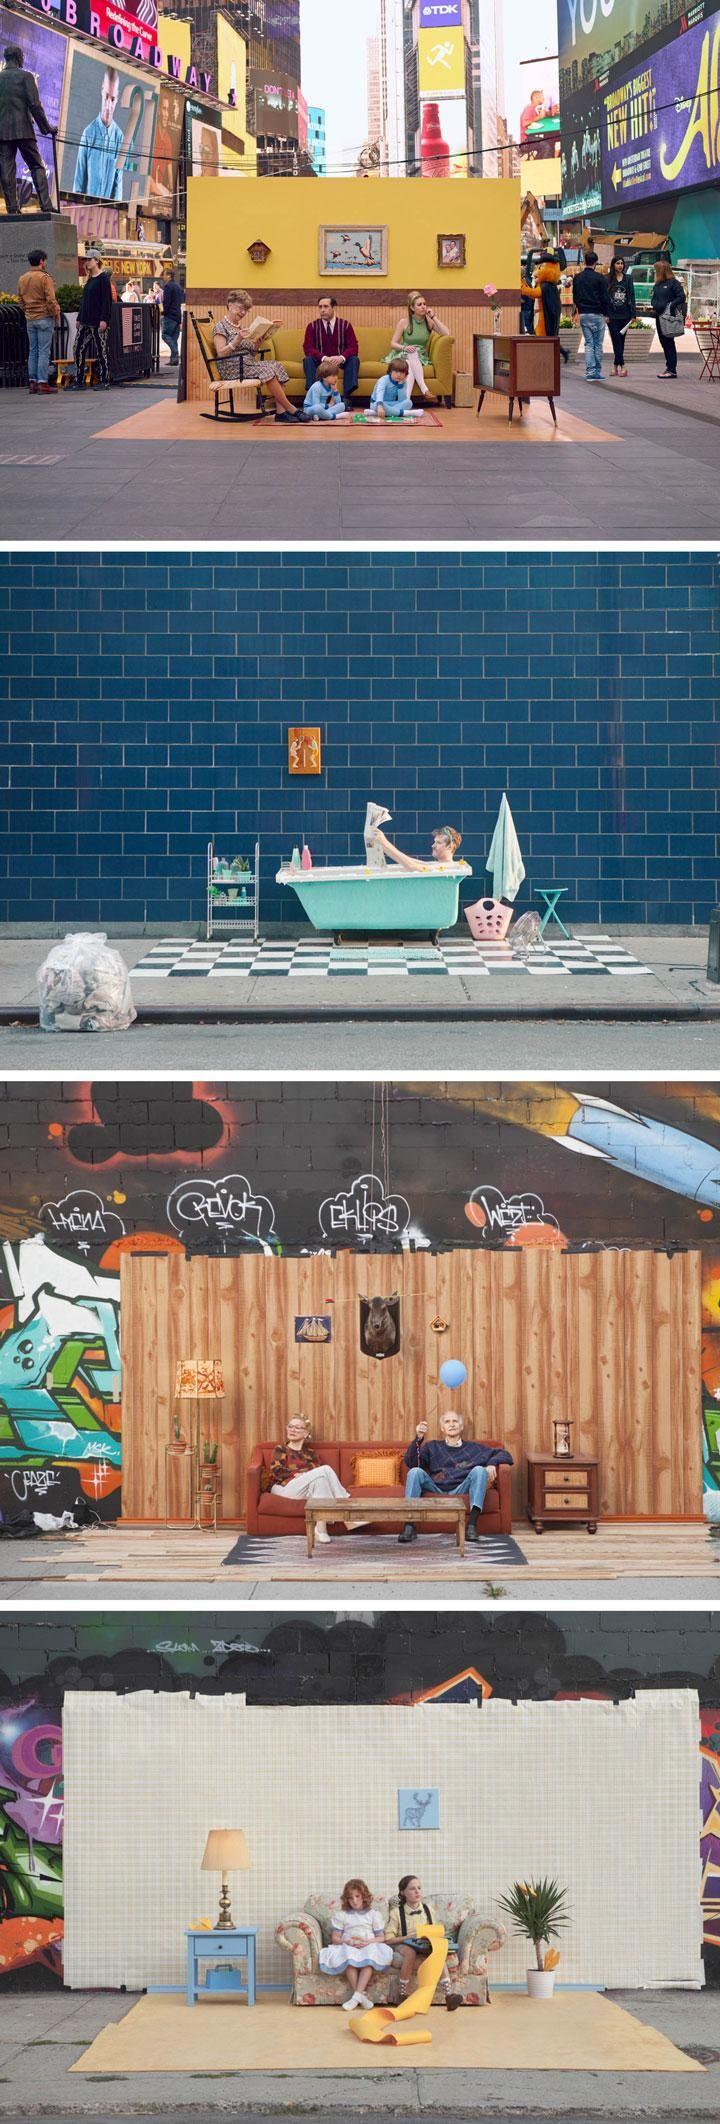 Best Street Installation Ideas On Pinterest Installation - Street artist turns street furniture into characters